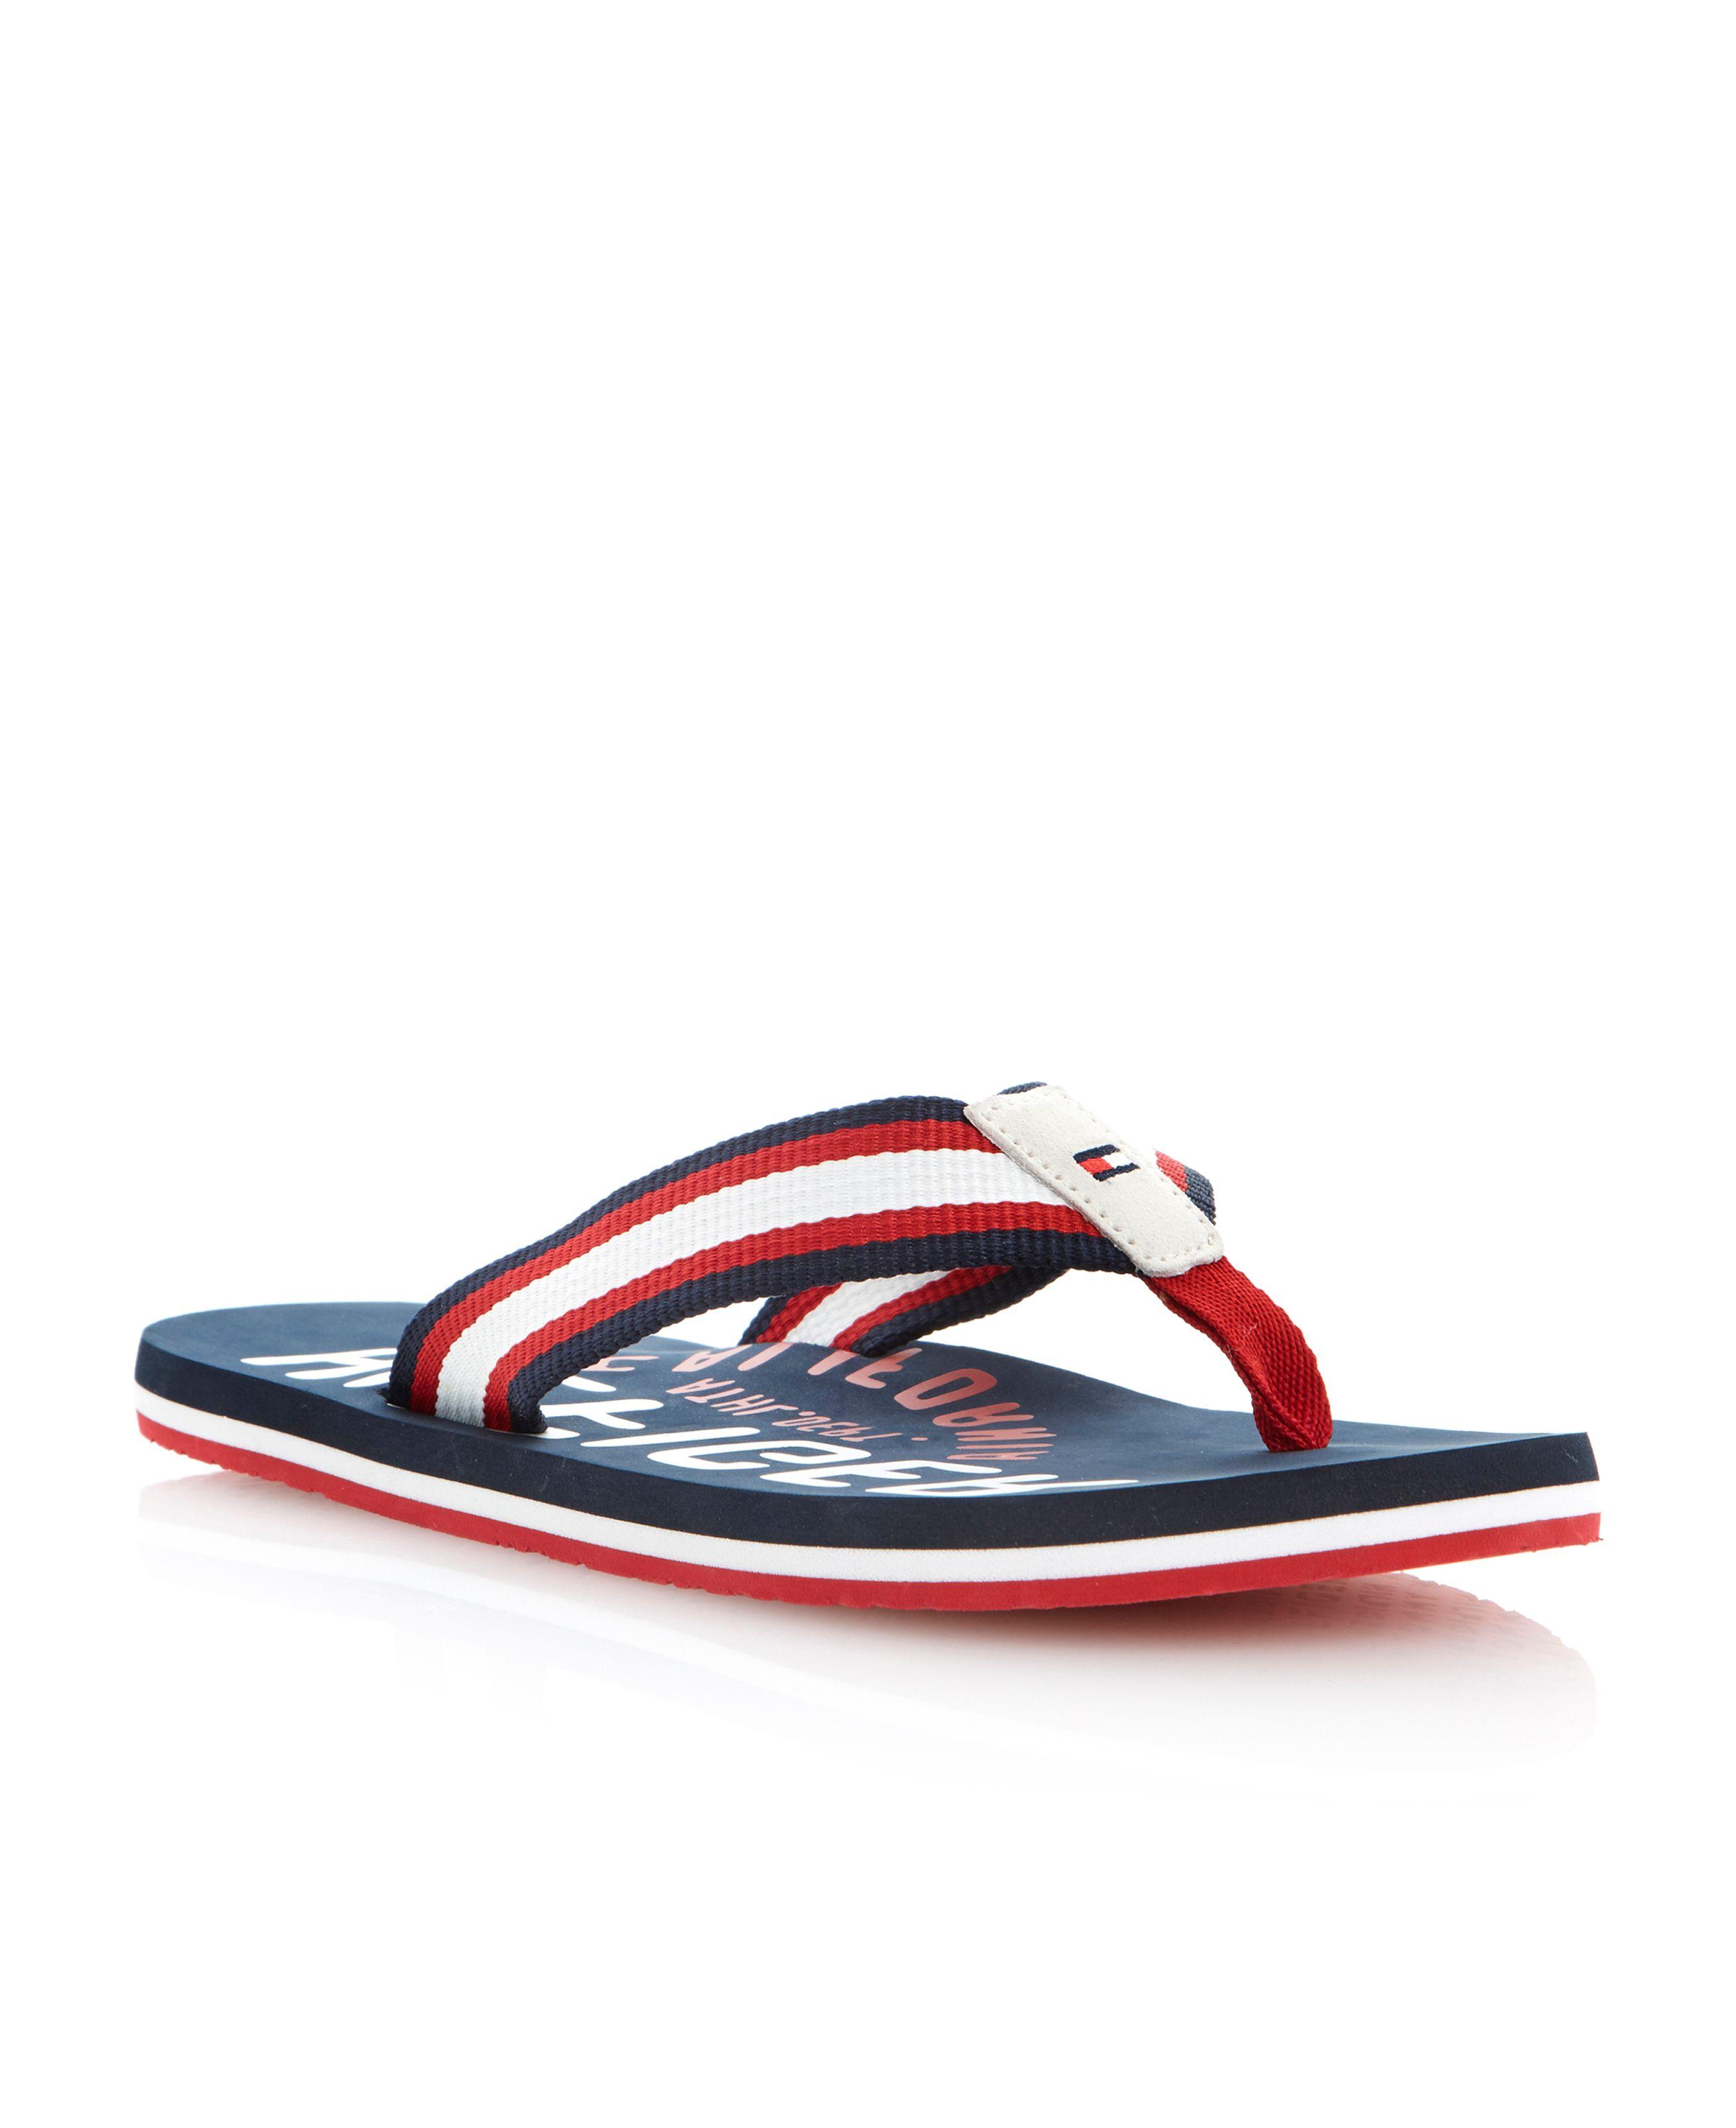 Stripe Beach Sandals - Sales Up to -50% Tommy Hilfiger AGrV2bVUc